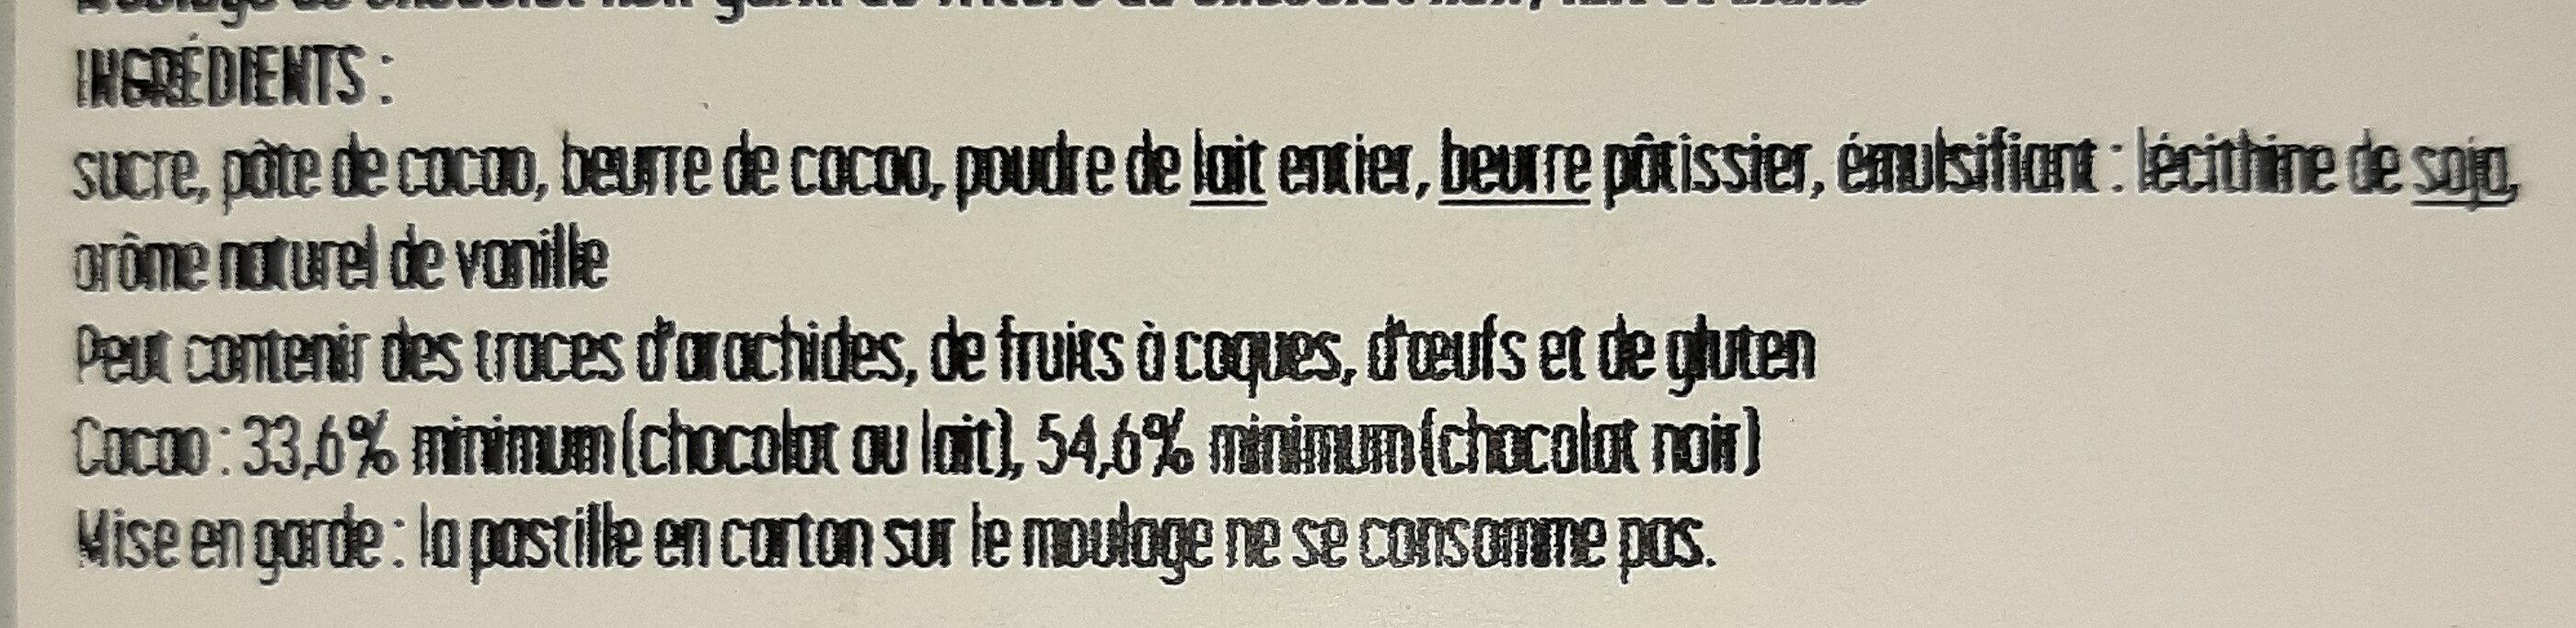 Oeuf ligne garni de fritures assortie. Chocolat noir - Ingredienti - fr